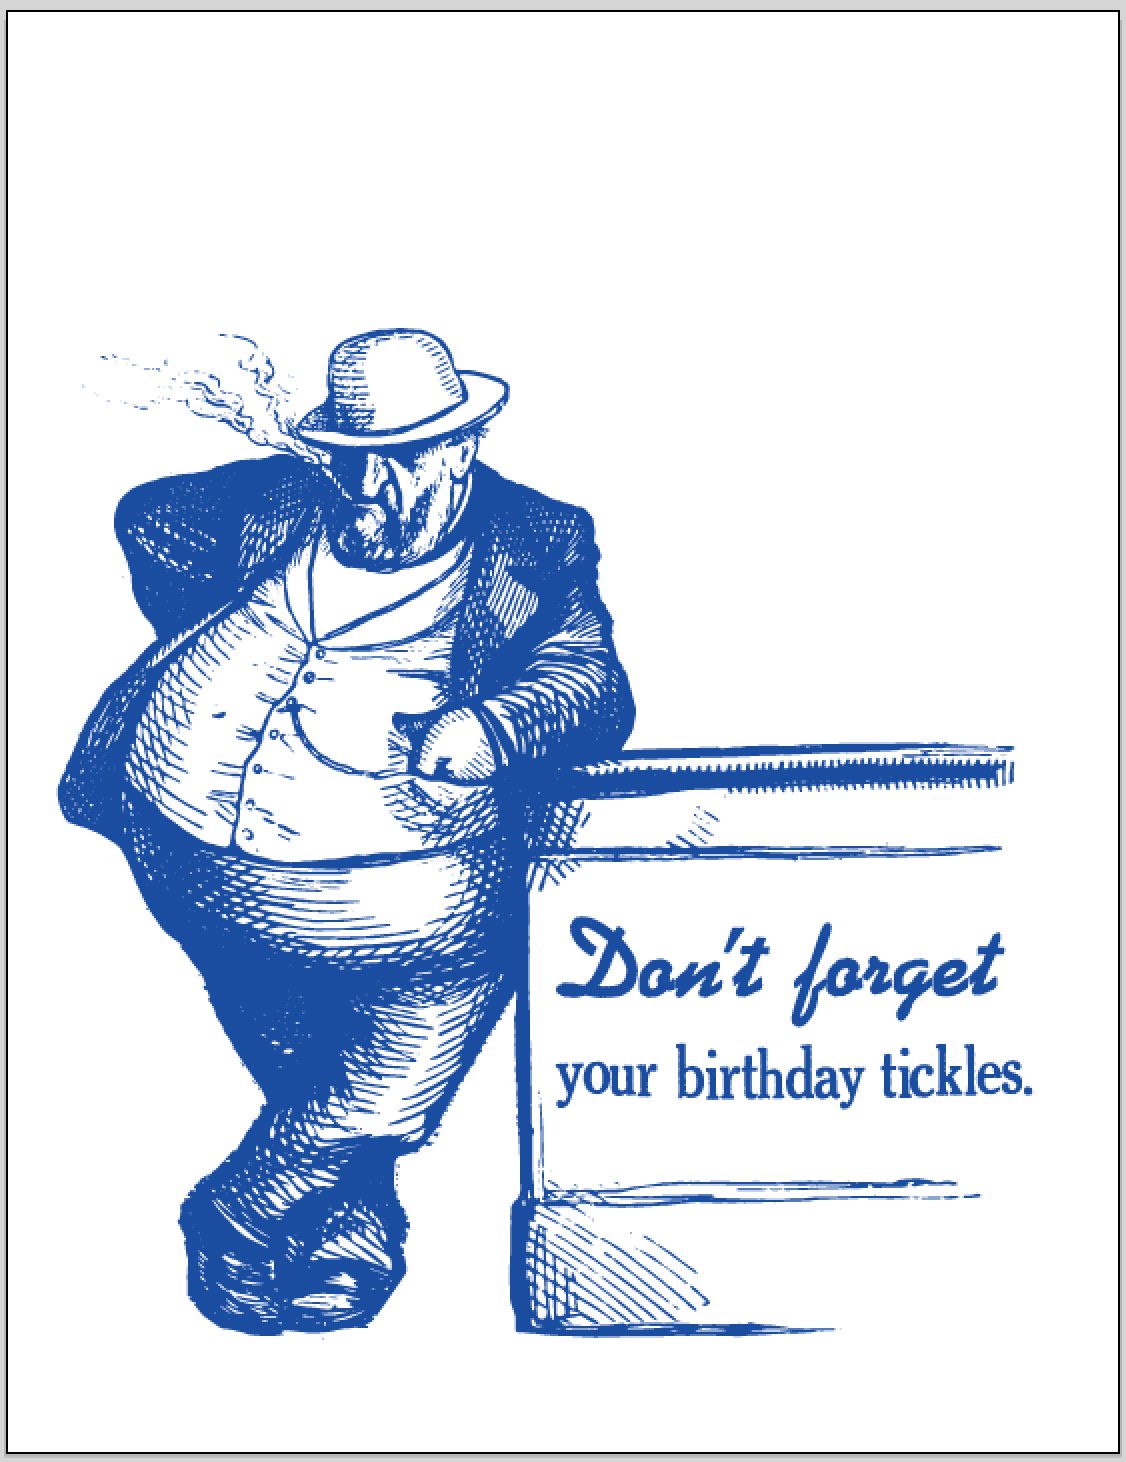 birthday tickles revised